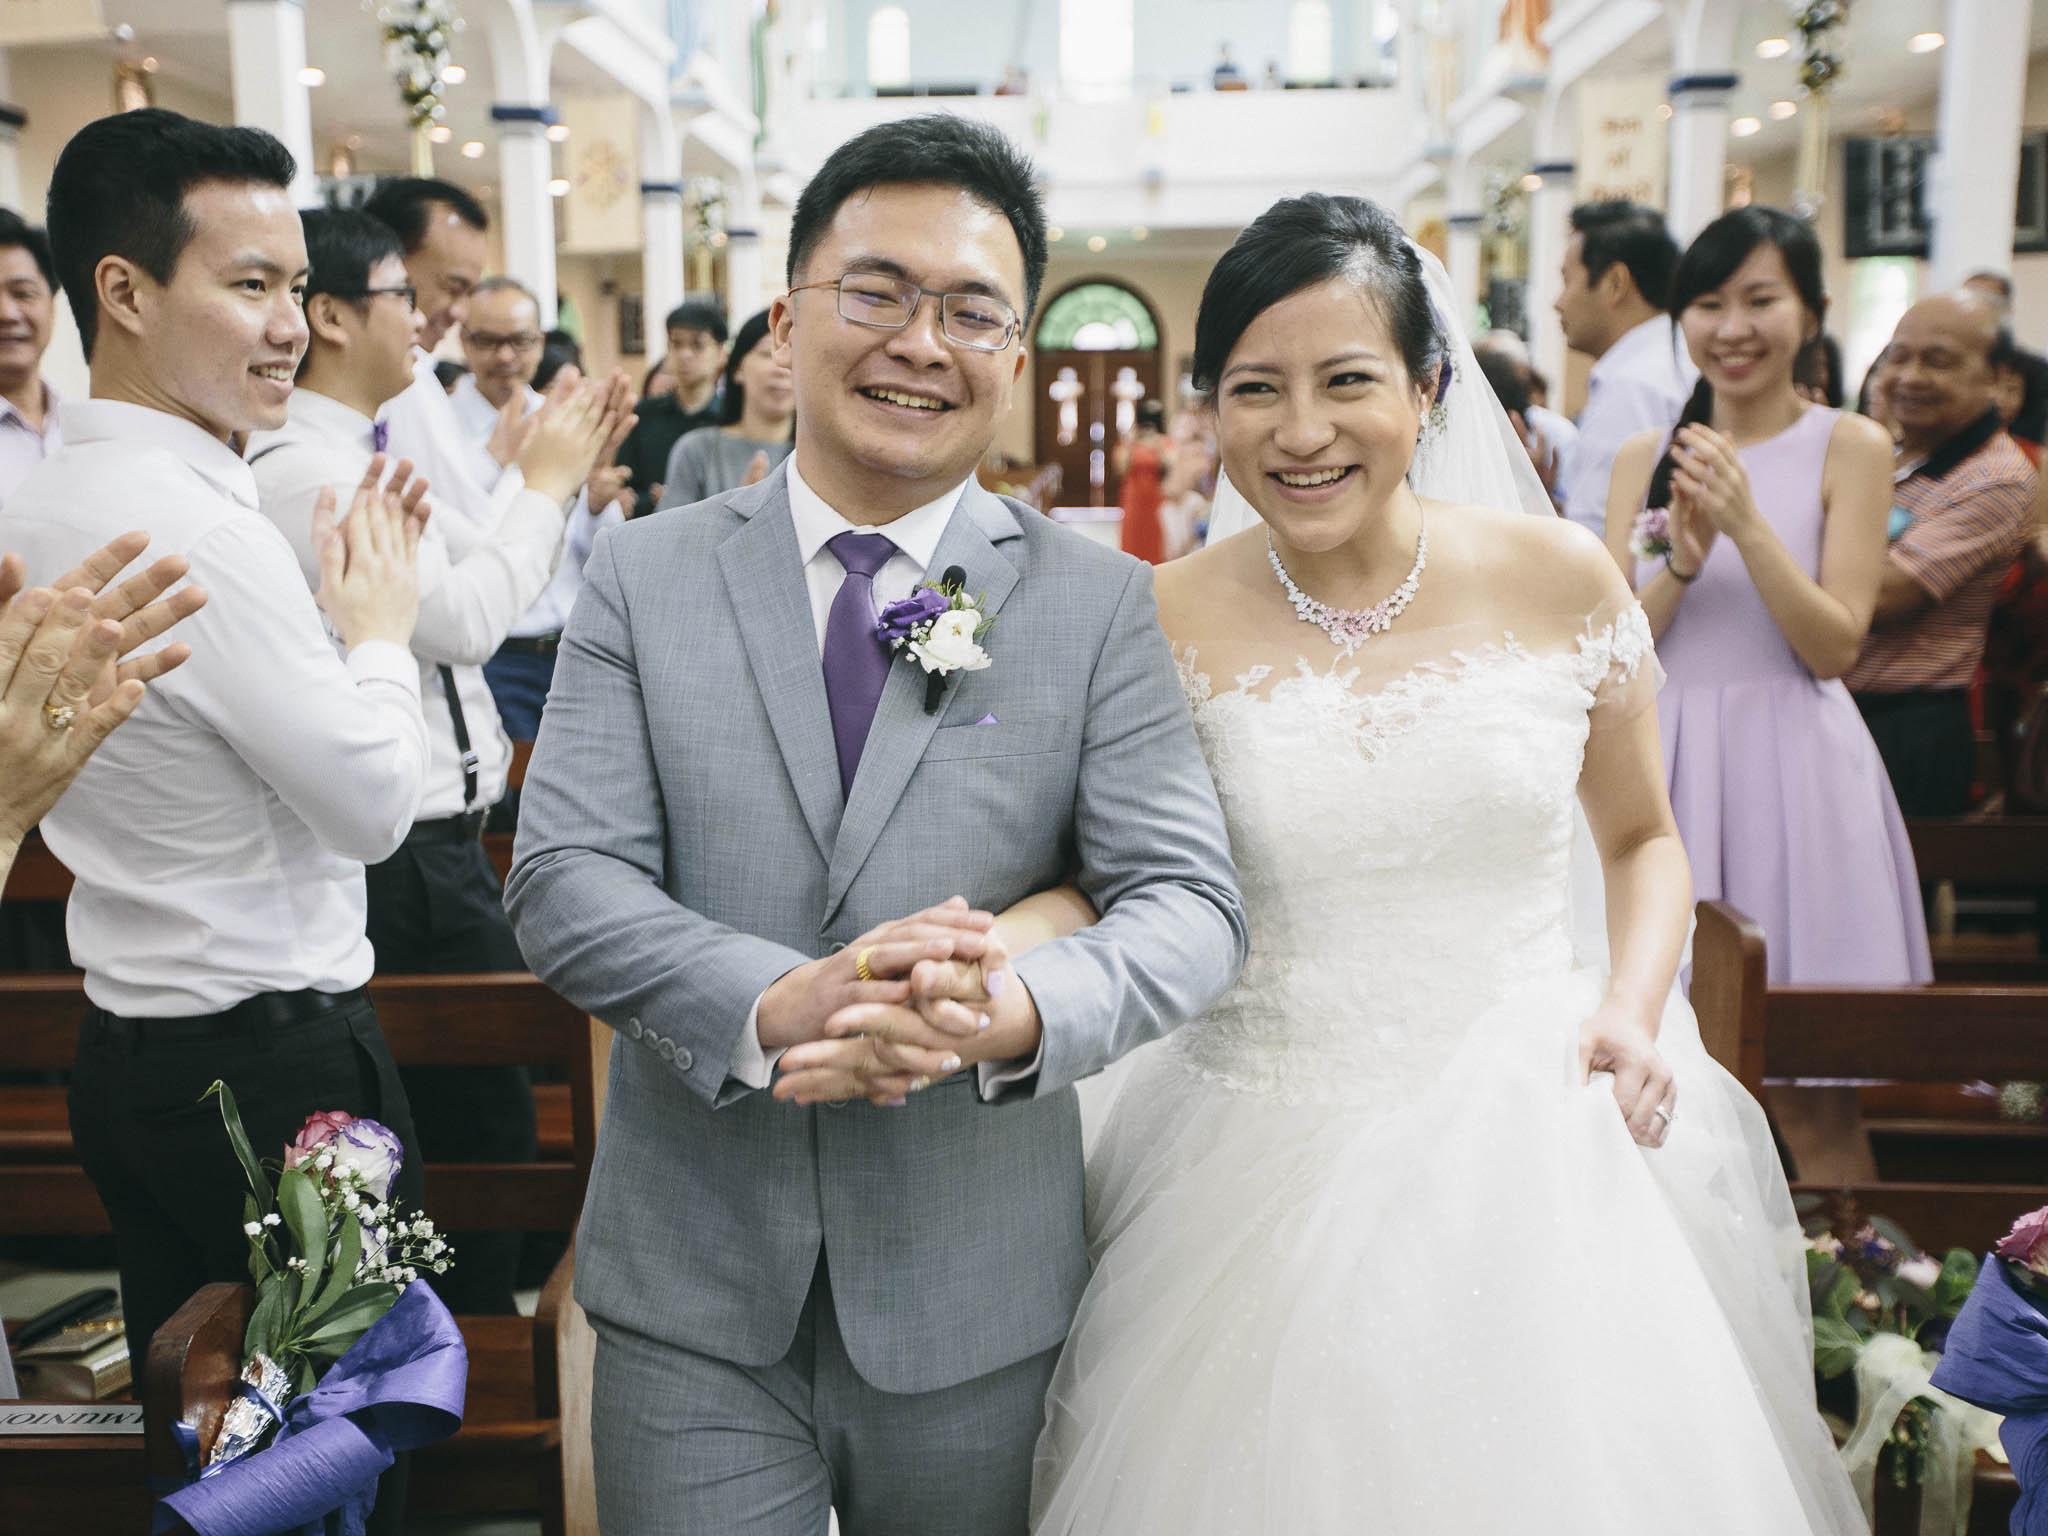 singapore-wedding-photographer-malay-indian-pre-wedding-travel-wmt-2015-66.jpg